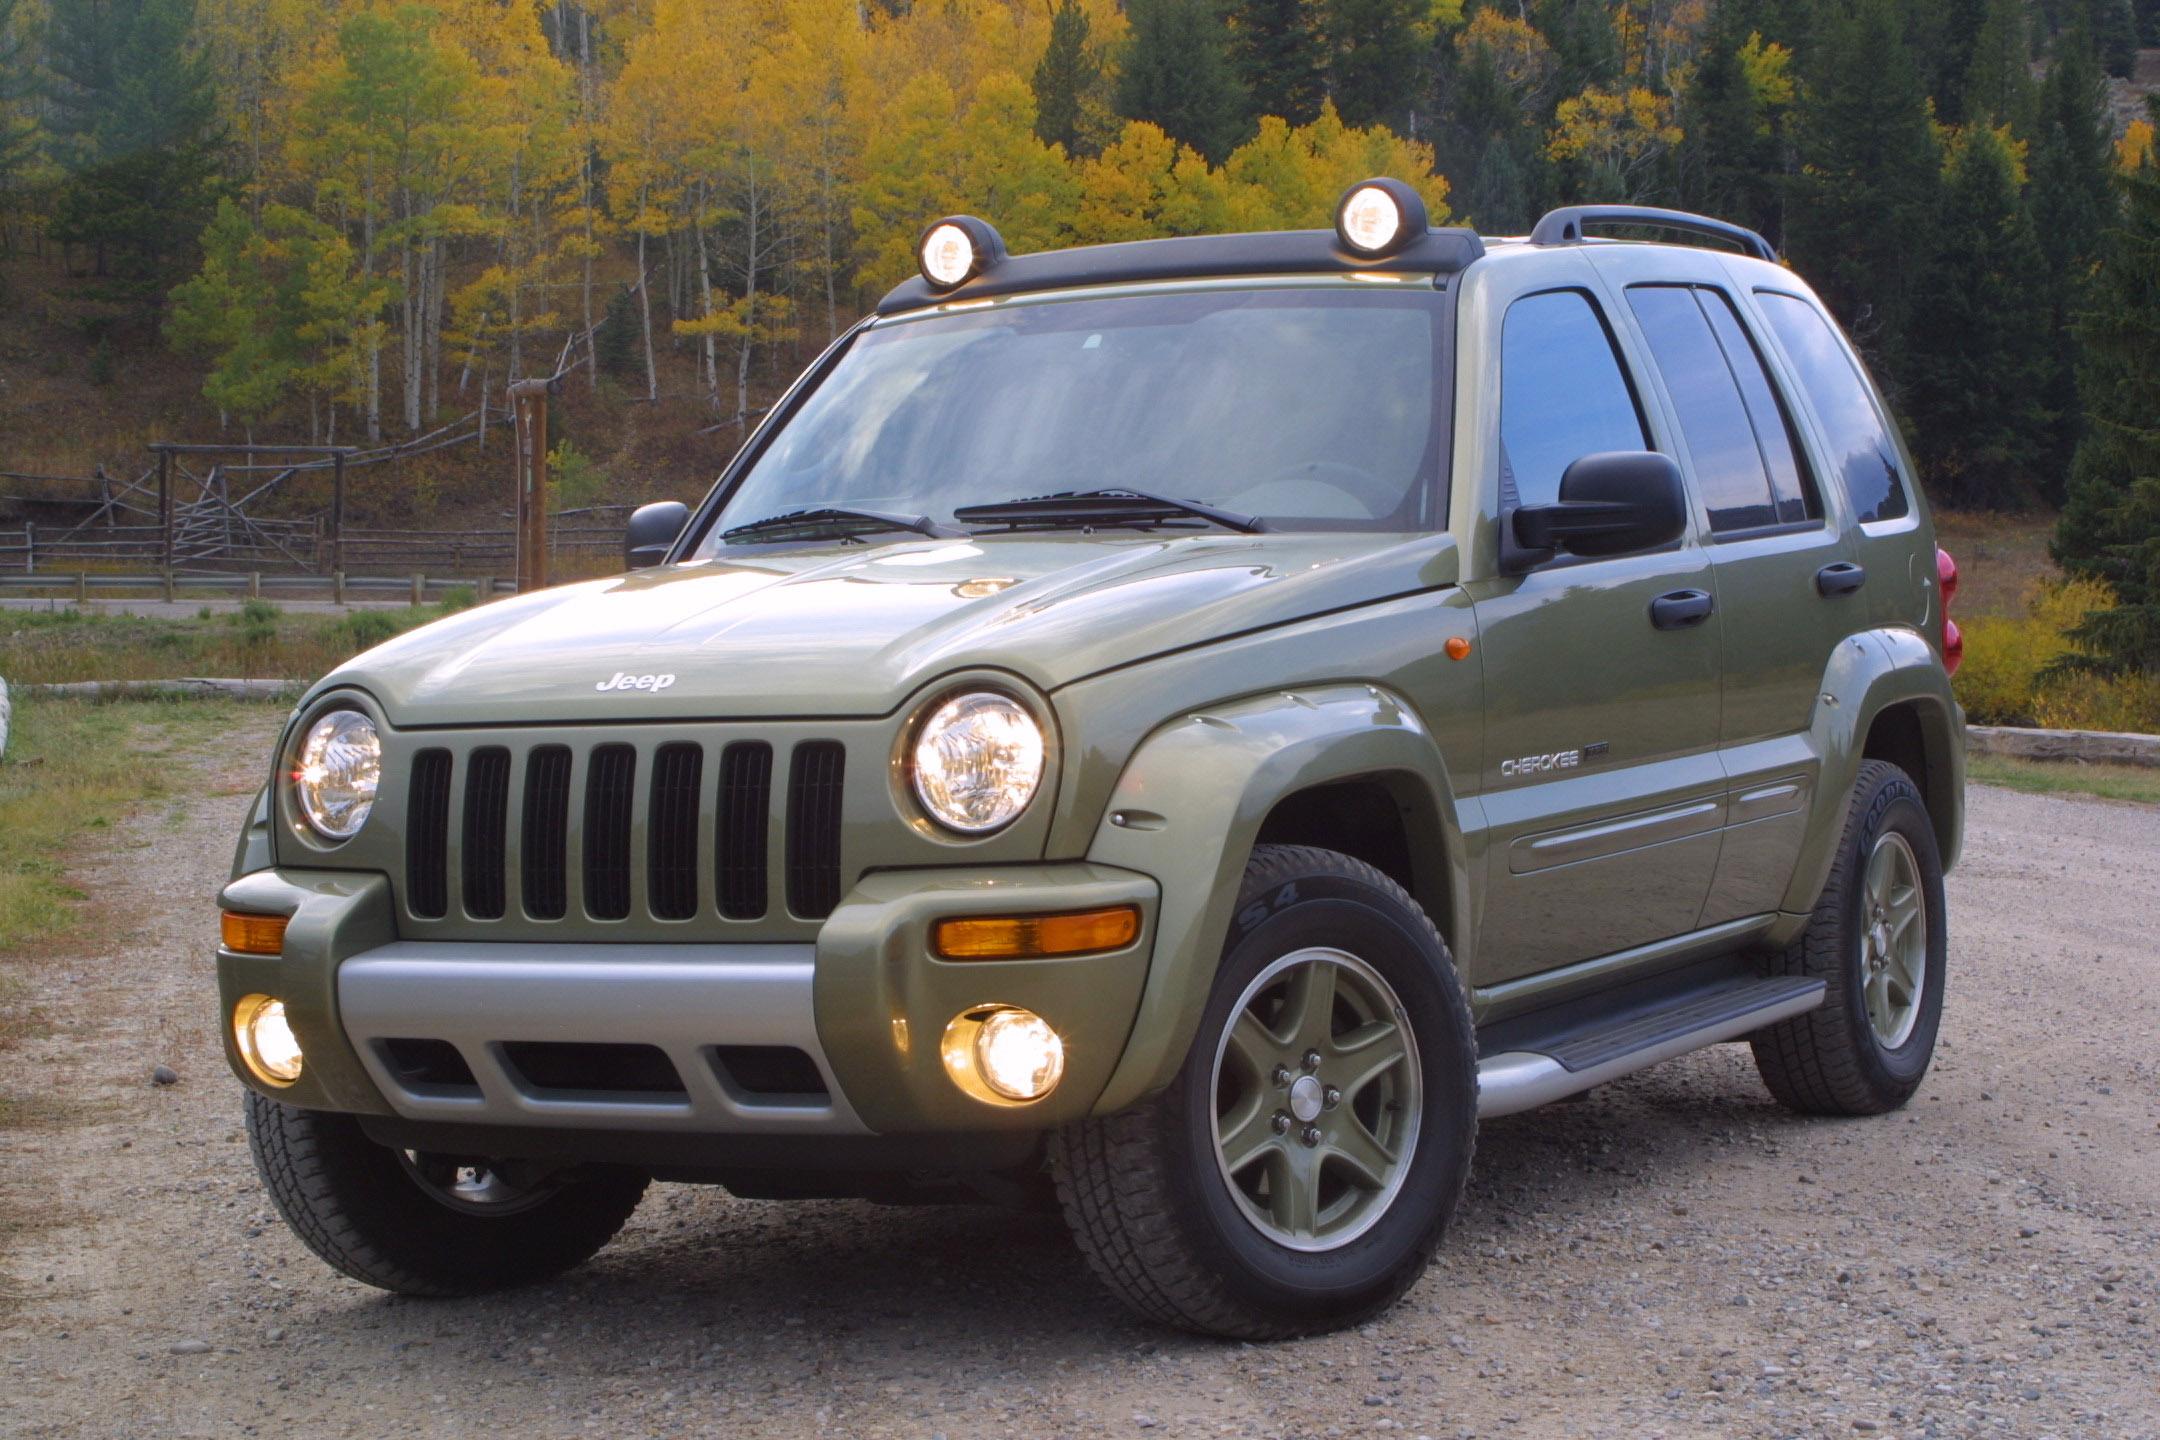 Jeep Cherokee Renegade photo #1